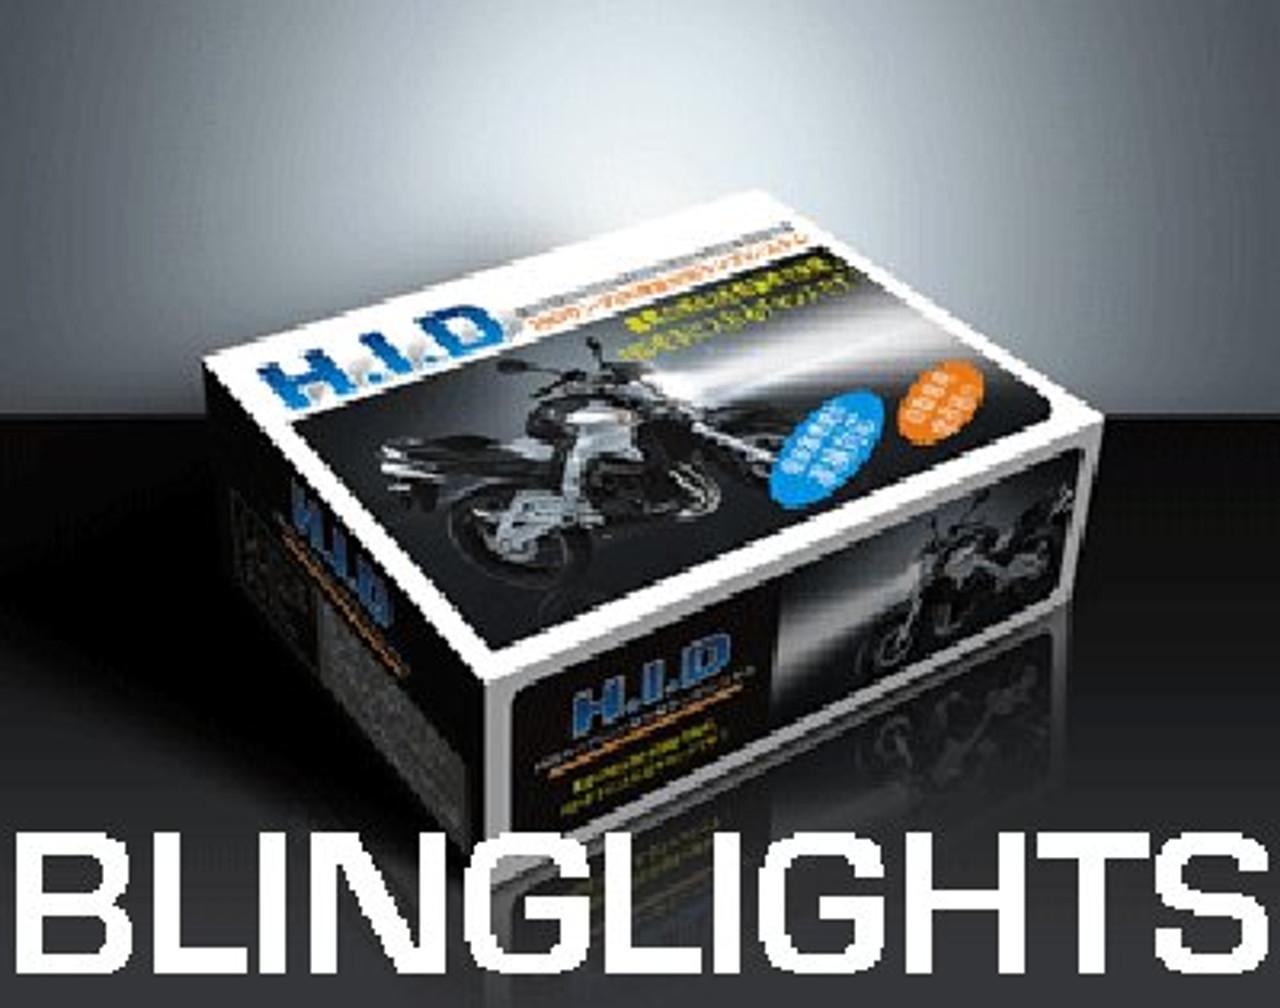 1996-2009 SUZUKI DR-200SE HID HEAD LIGHT LAMP HEADLIGHT HEADLAMP KIT 1997 1998 1999 2000 2001 2002